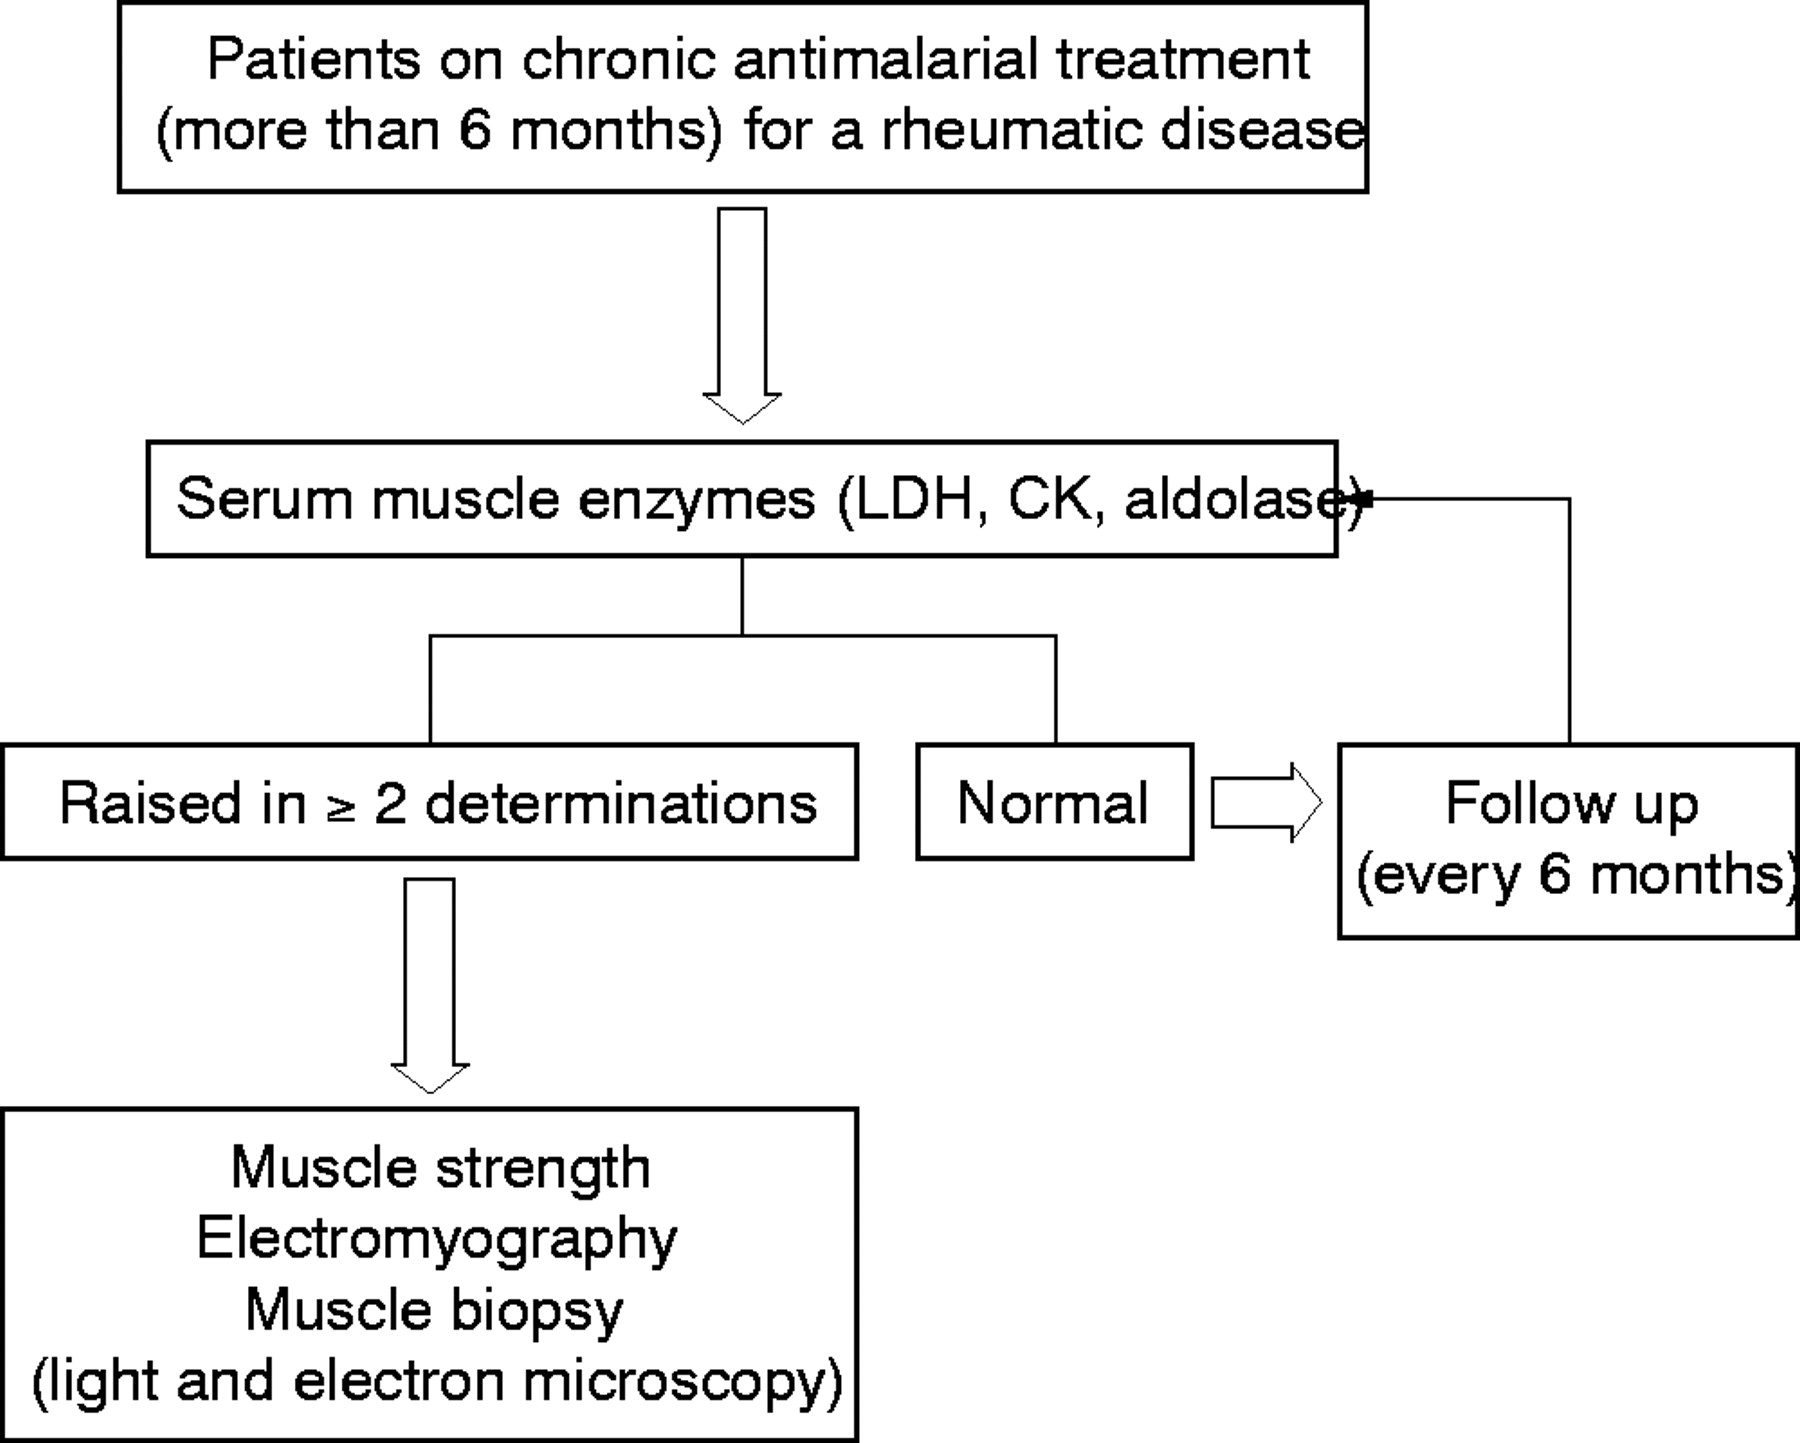 plaquenil gebelik kategorisi